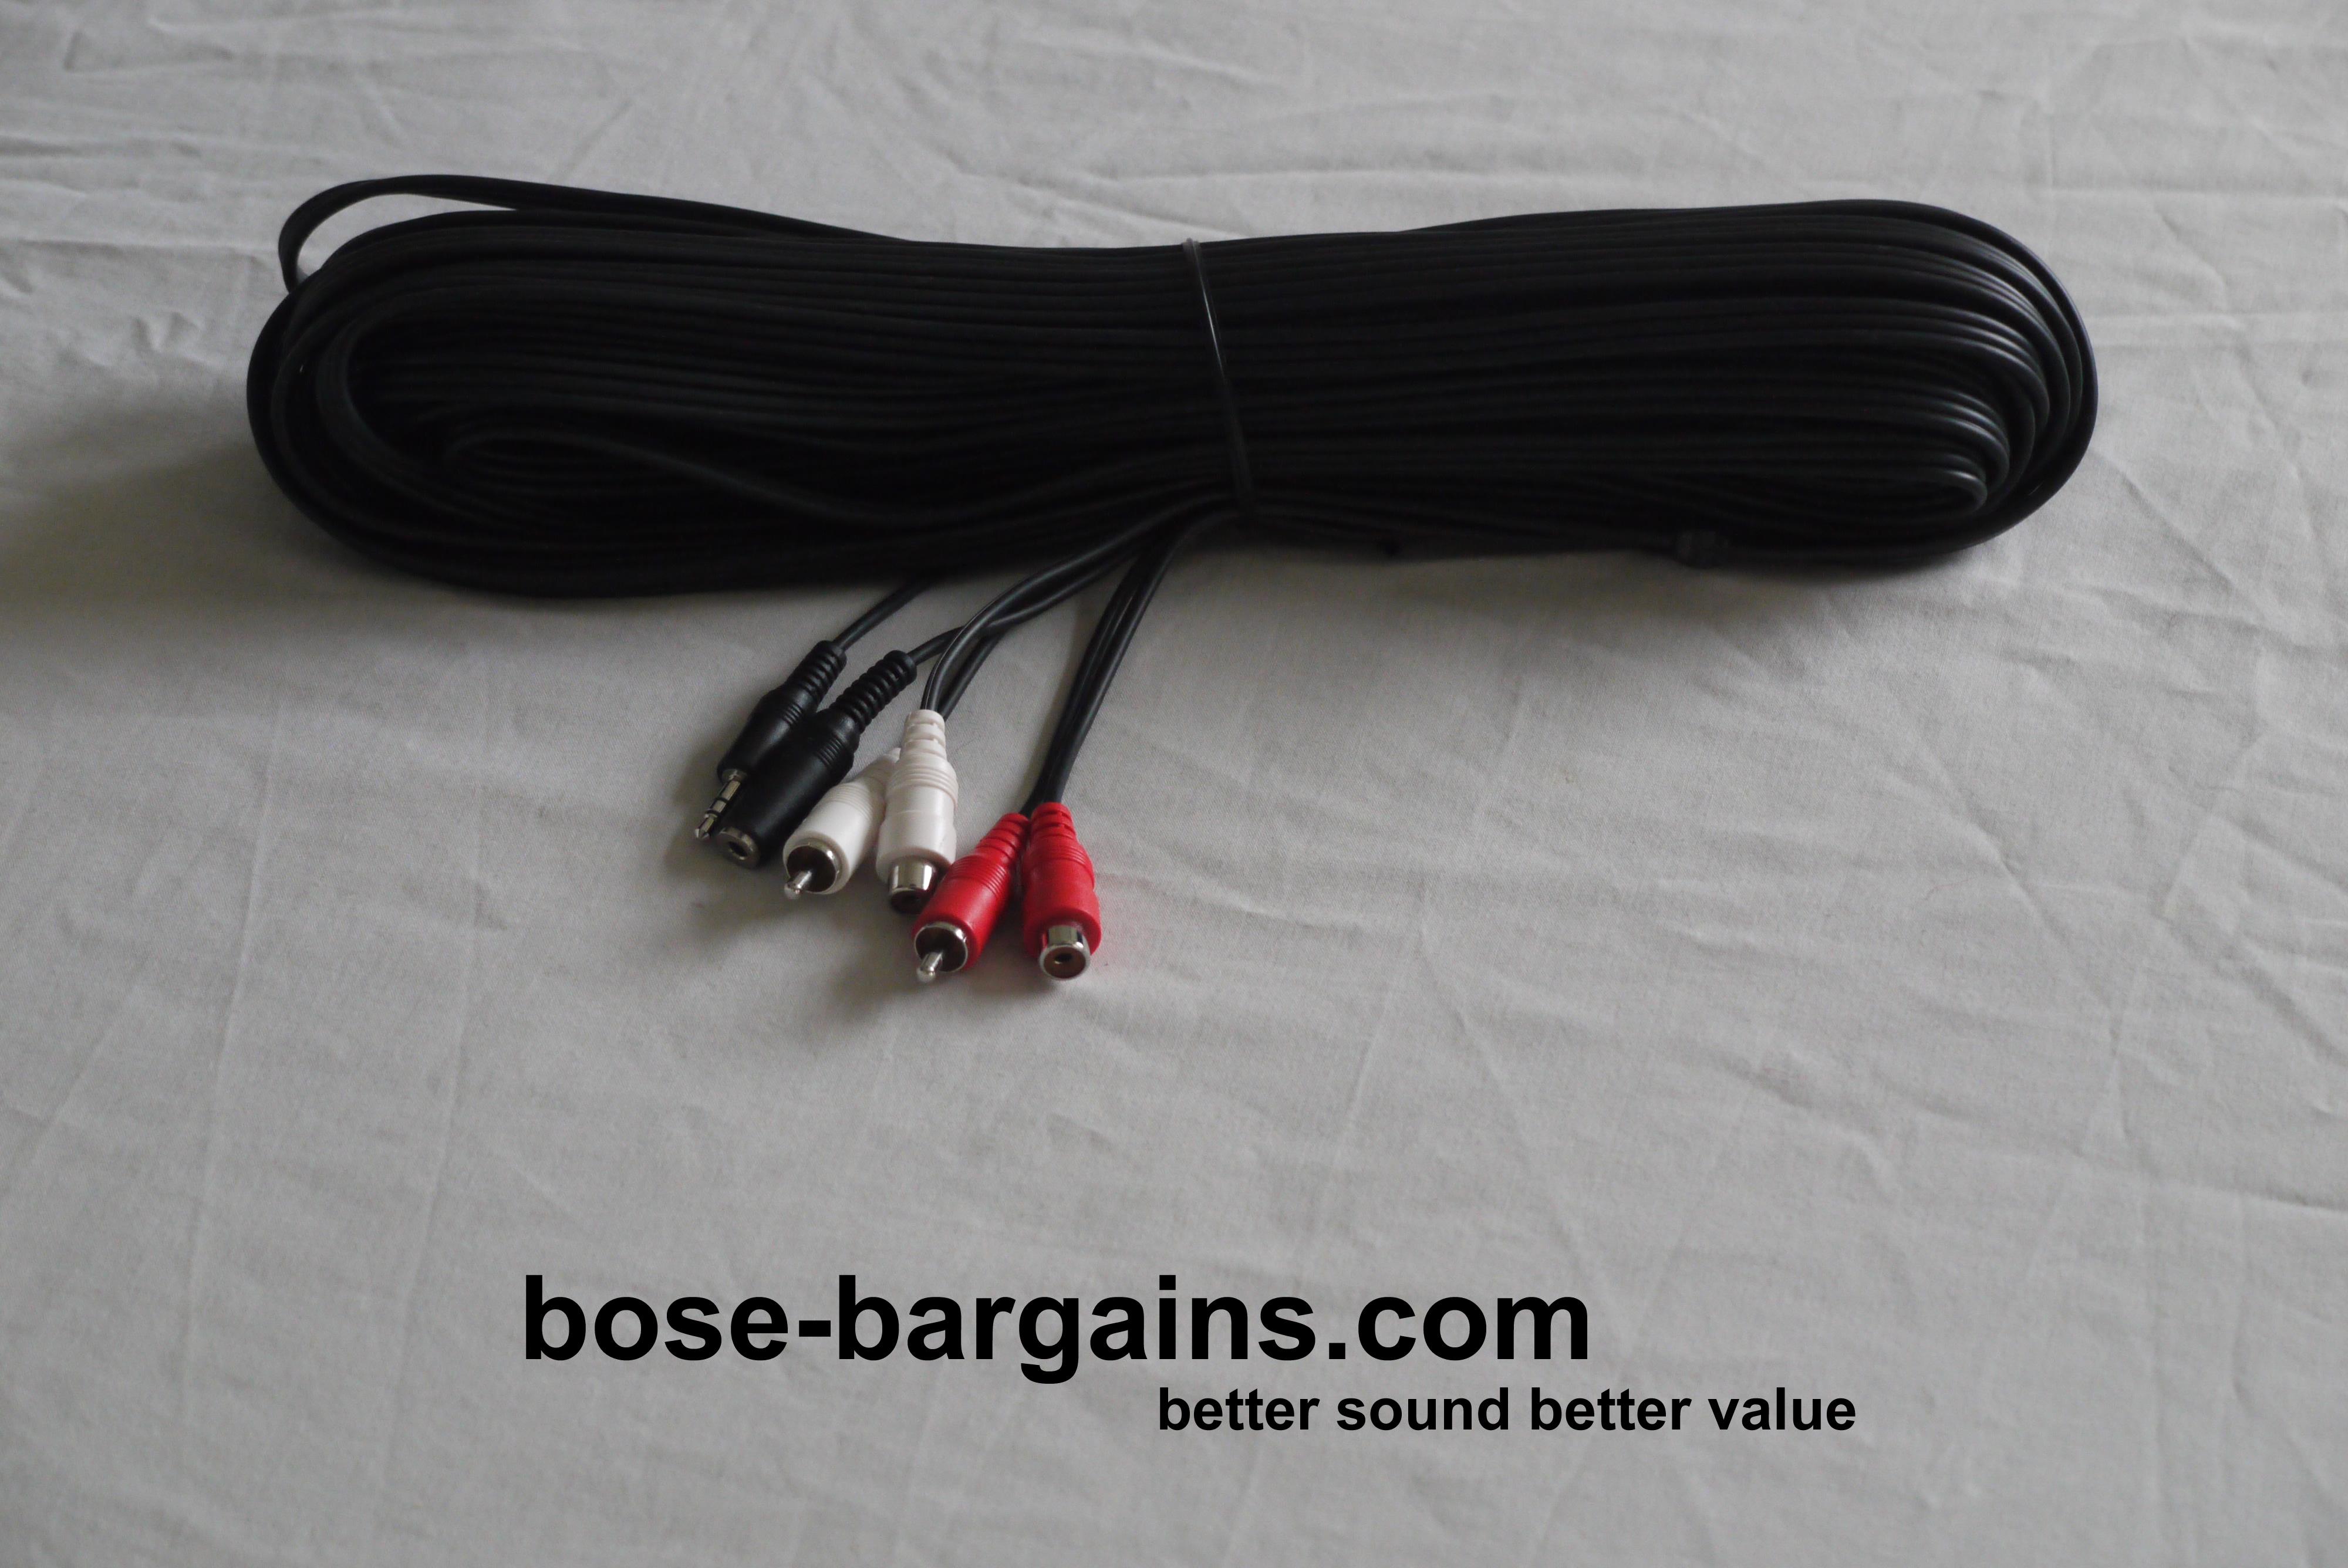 Bose Lifestyle Link Cable Extension - bose-bargains.comBose Bargains